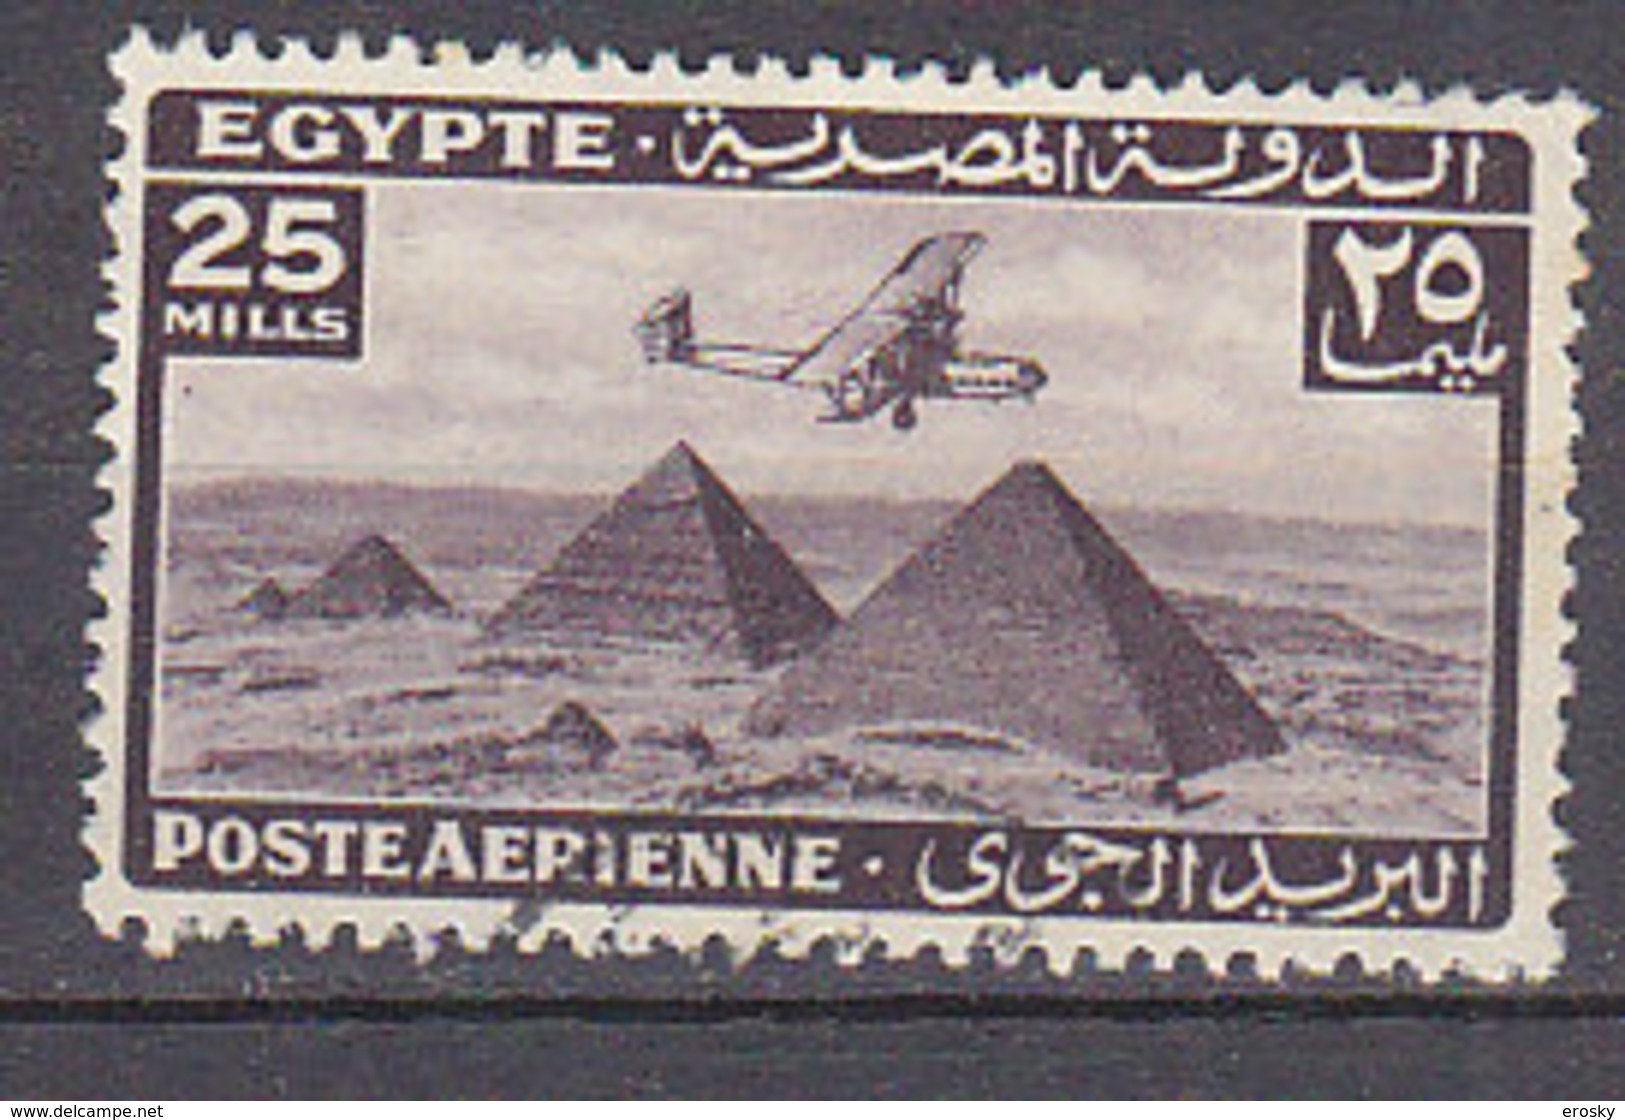 A0775 - EGYPTE EGYPT AERIENNE Yv N°27 - Poste Aérienne